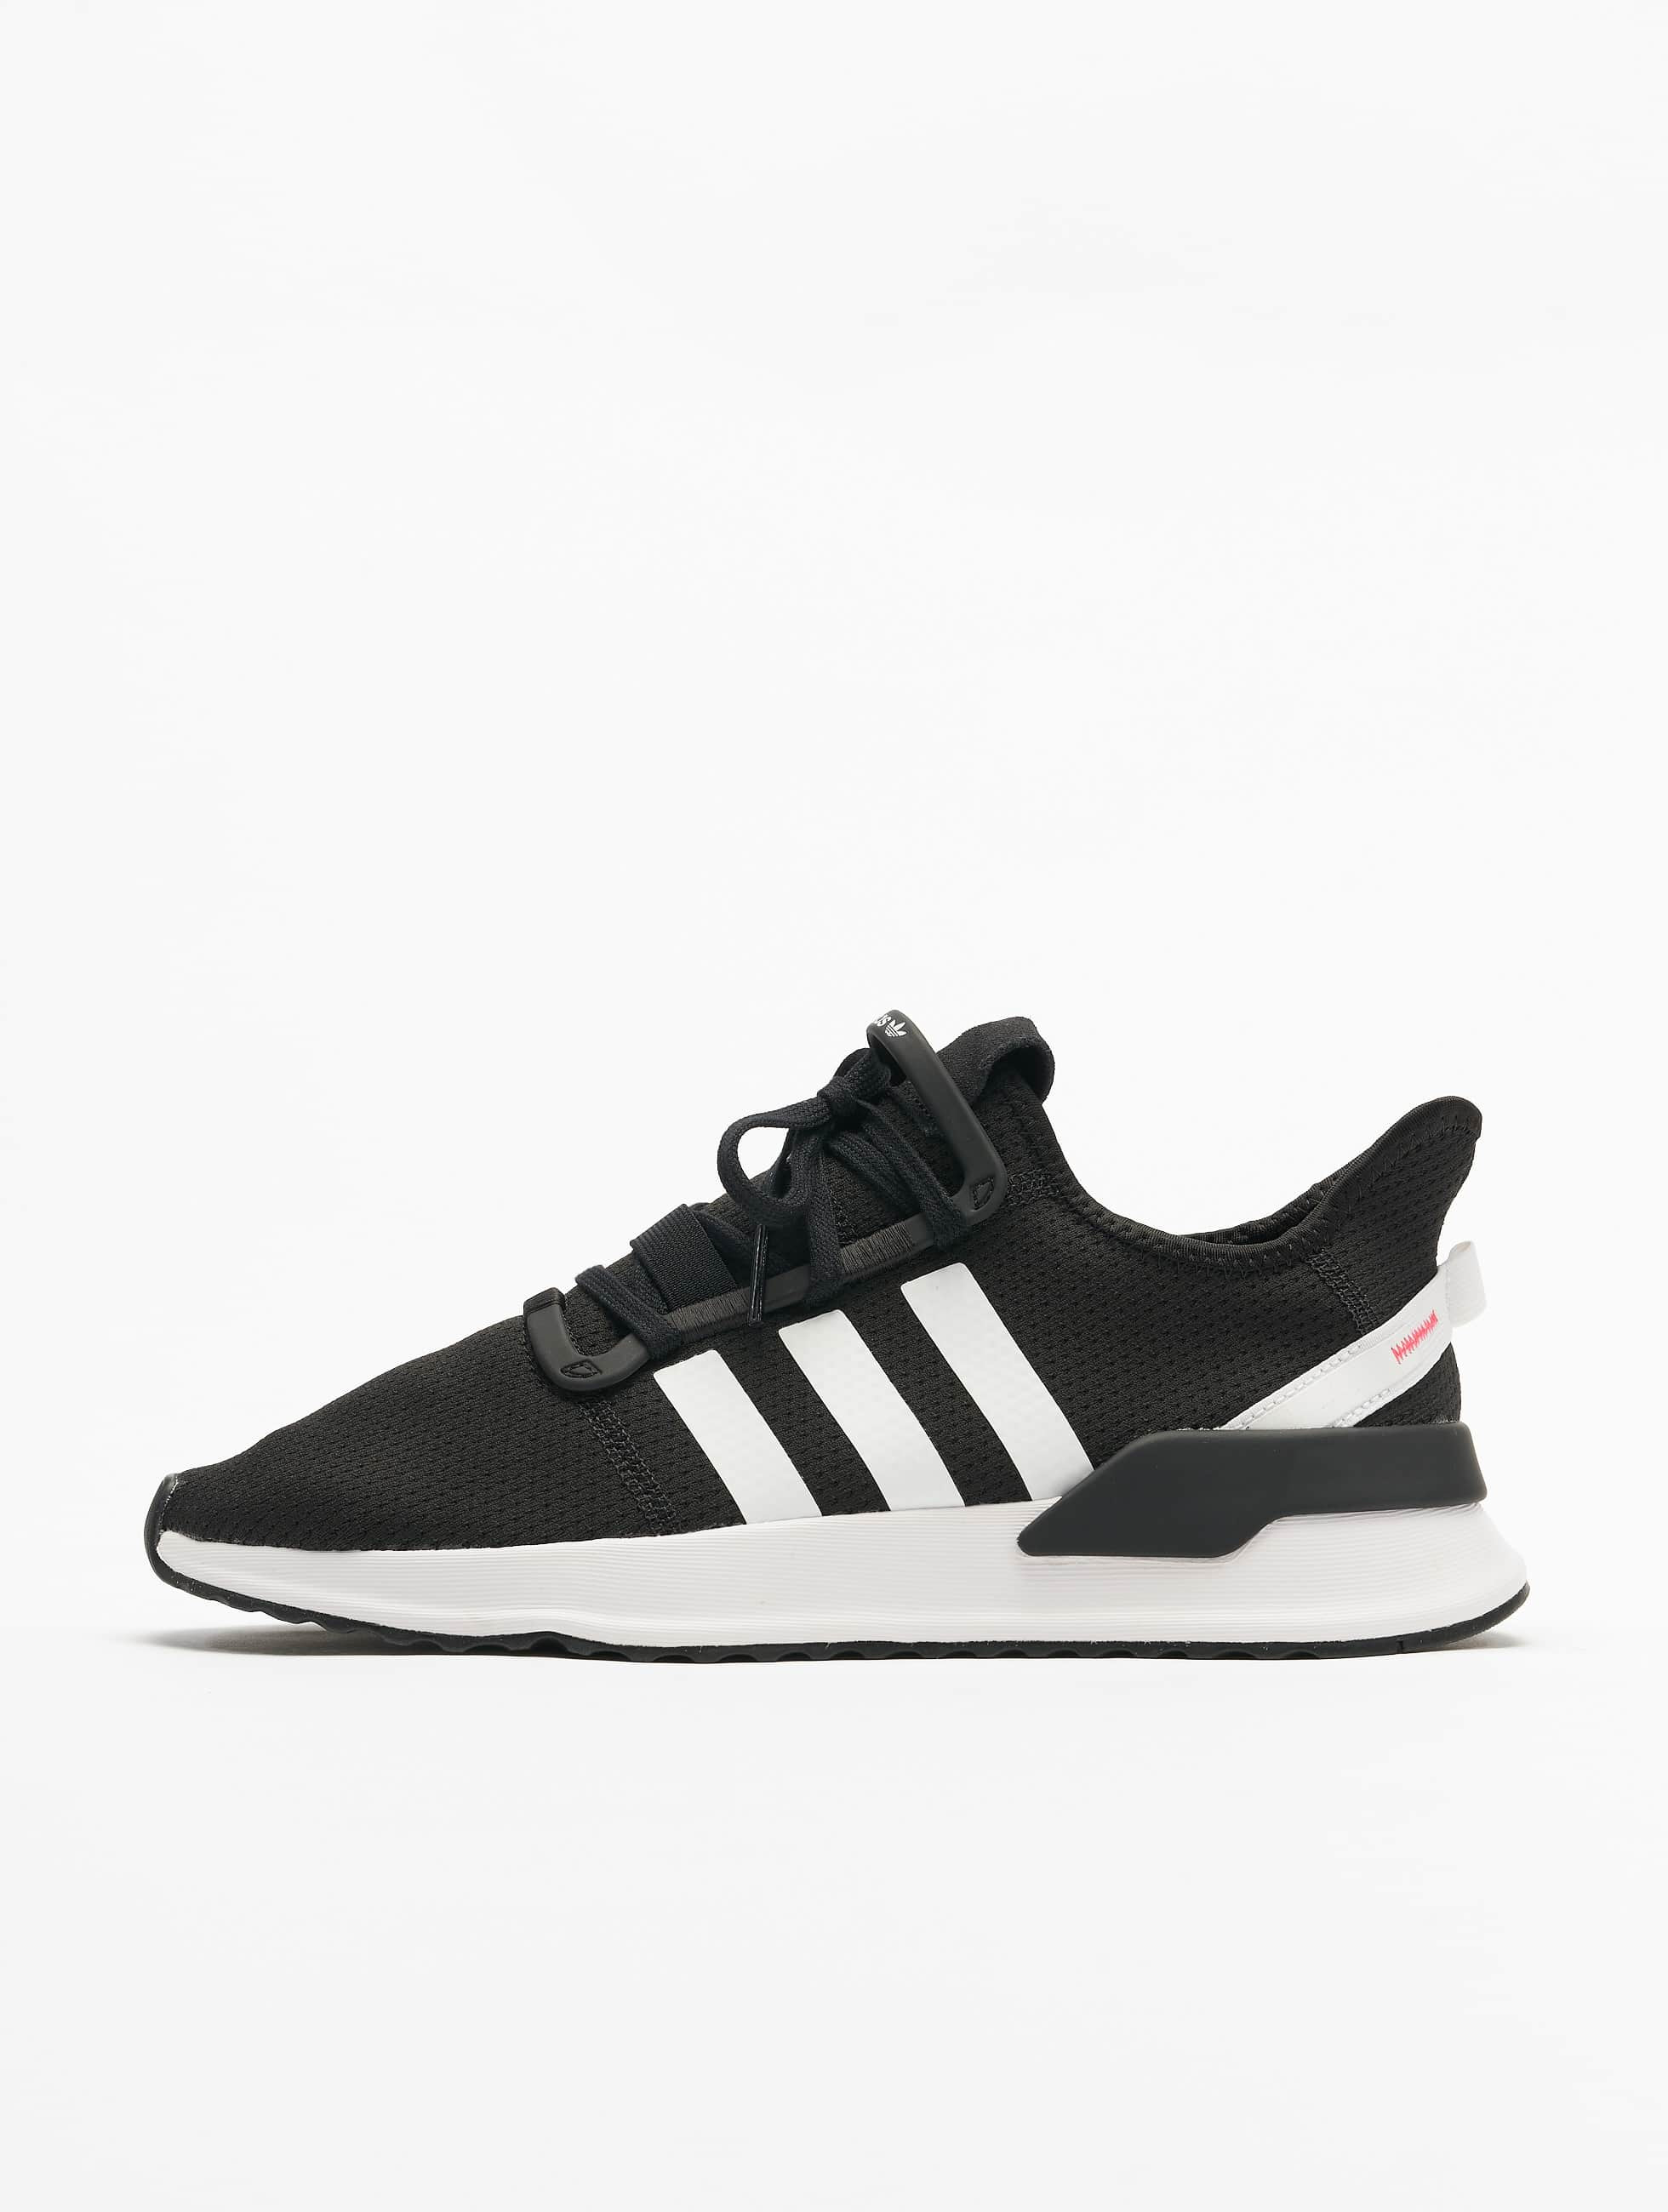 Adidas Originals U_Path Run Sneakers Core Black